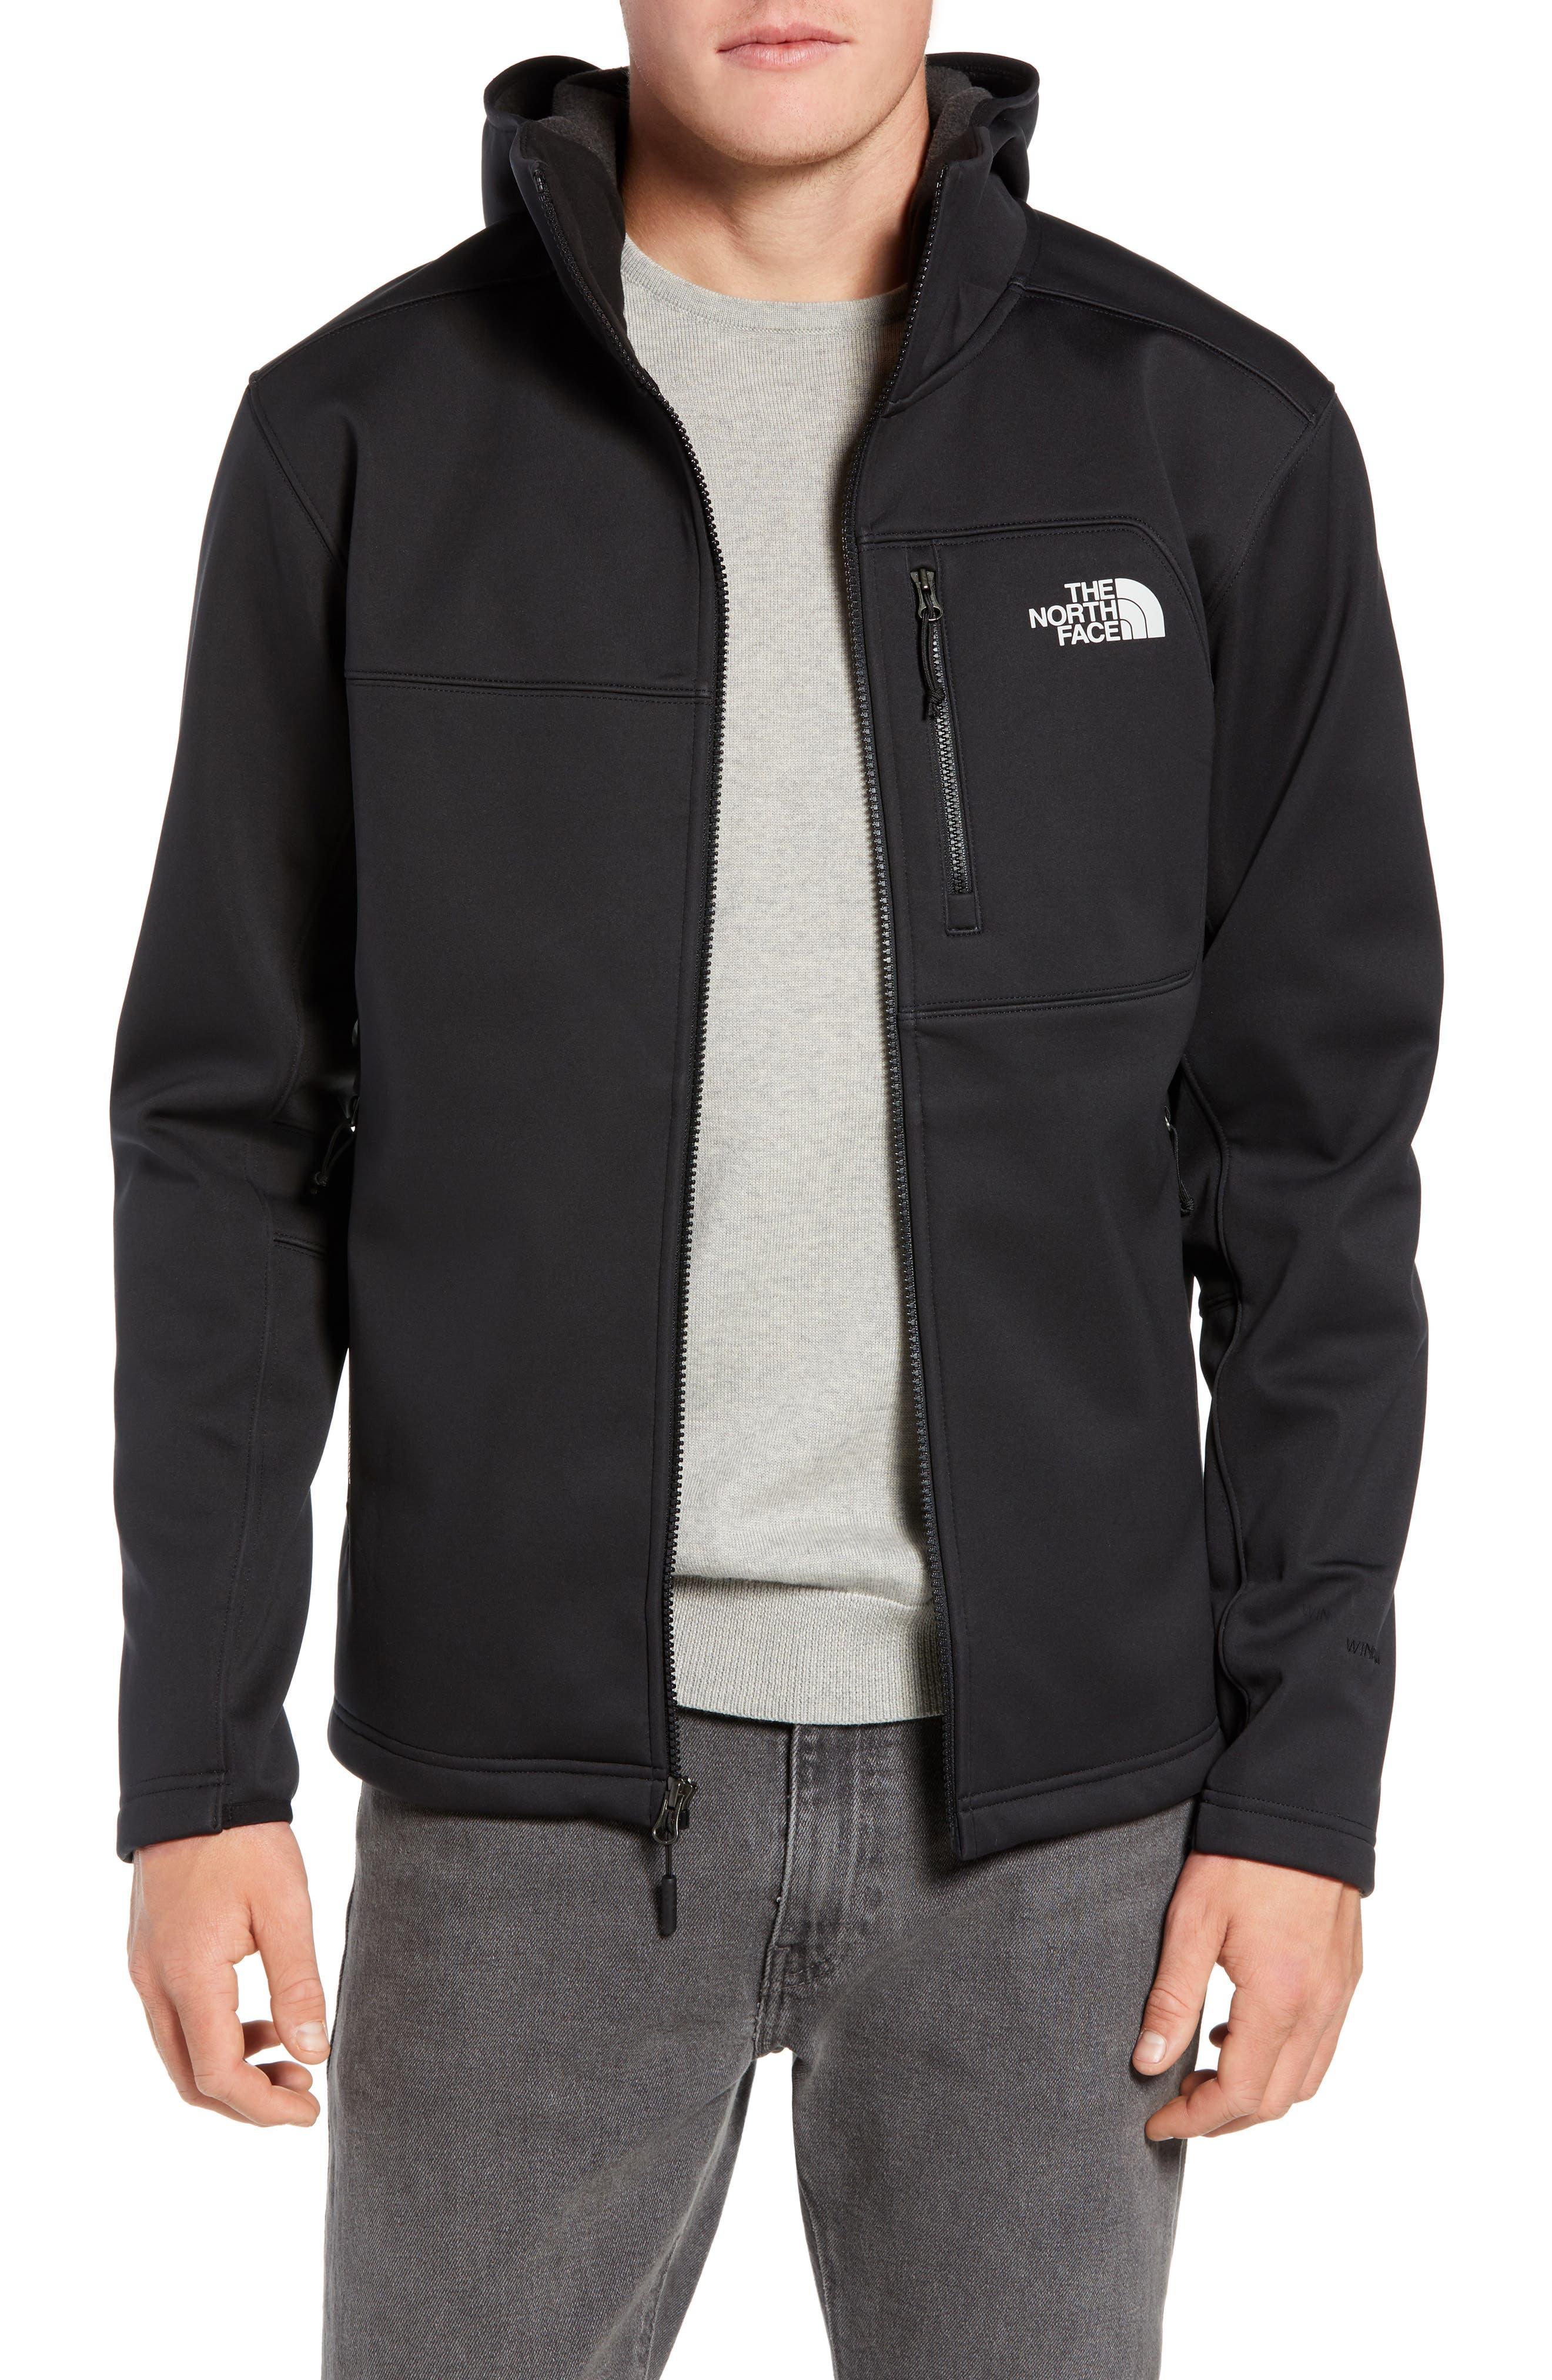 North Face Apex Risor Hooded Jacket,                         Main,                         color, TNF BLACK/ TNF BLACK